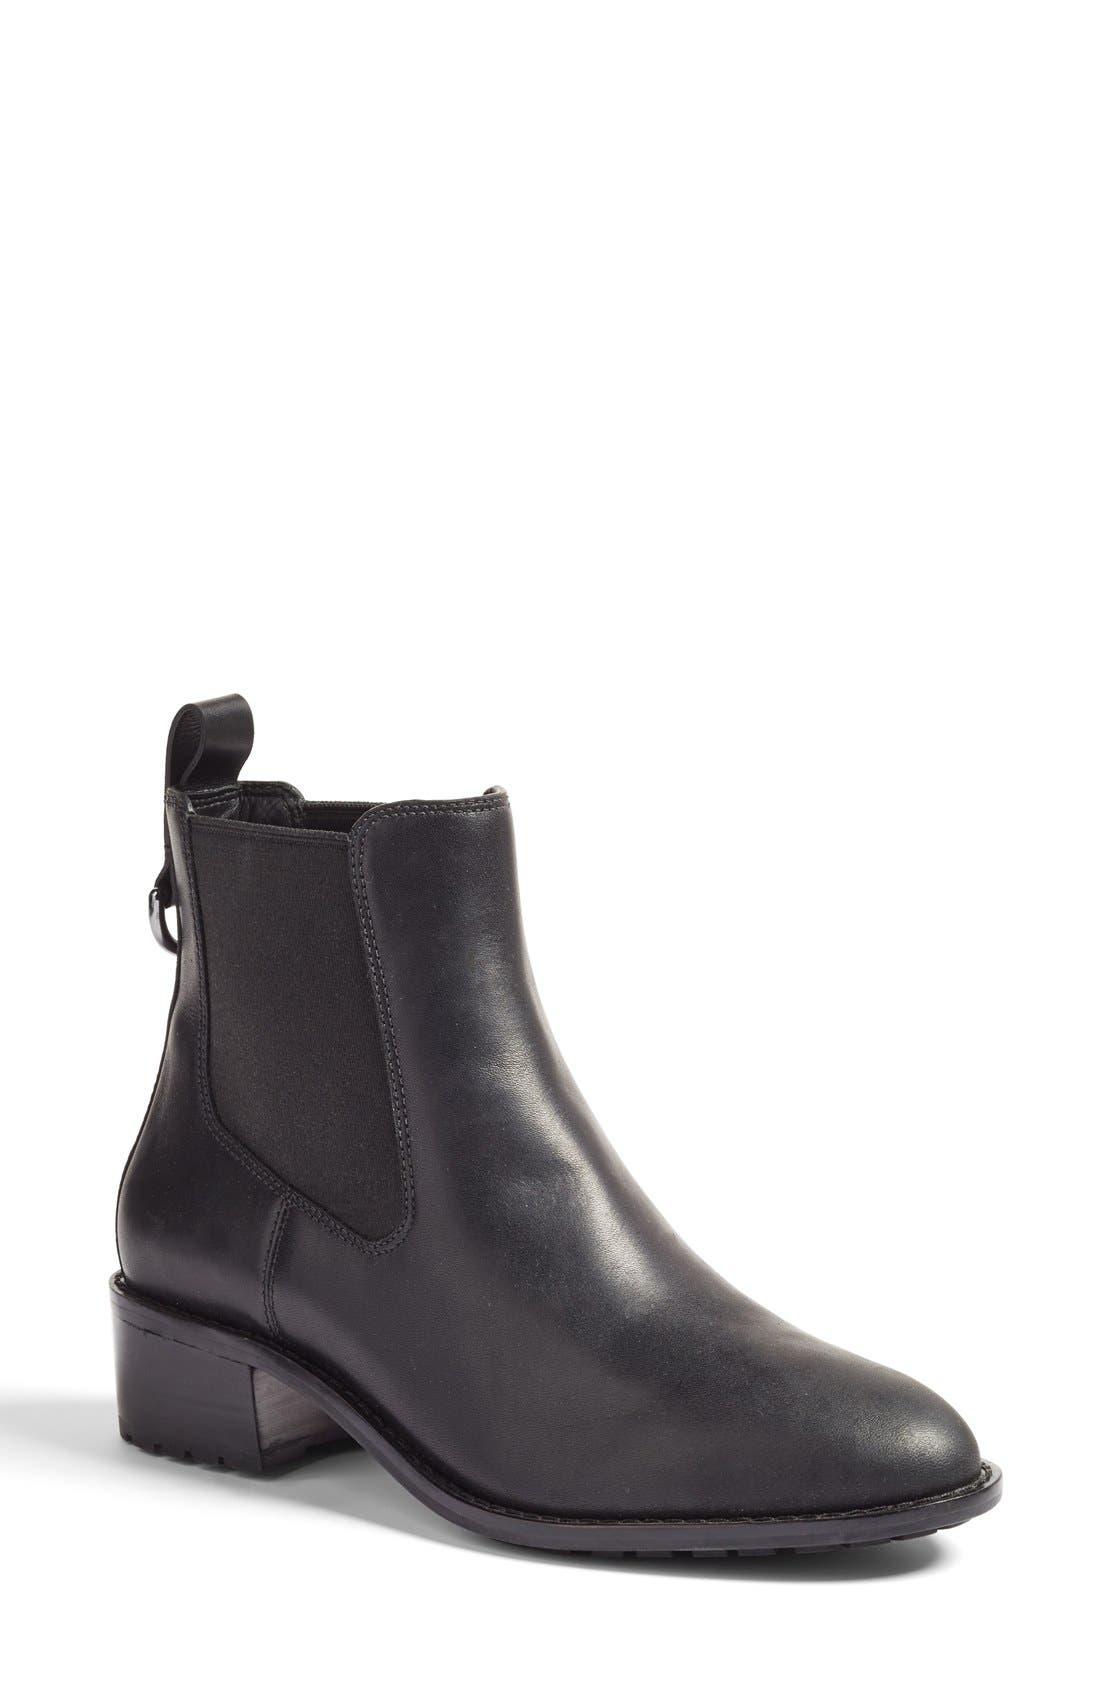 COLE HAAN, Newburg Waterproof Chelsea Boot, Main thumbnail 1, color, BLACK LEATHER